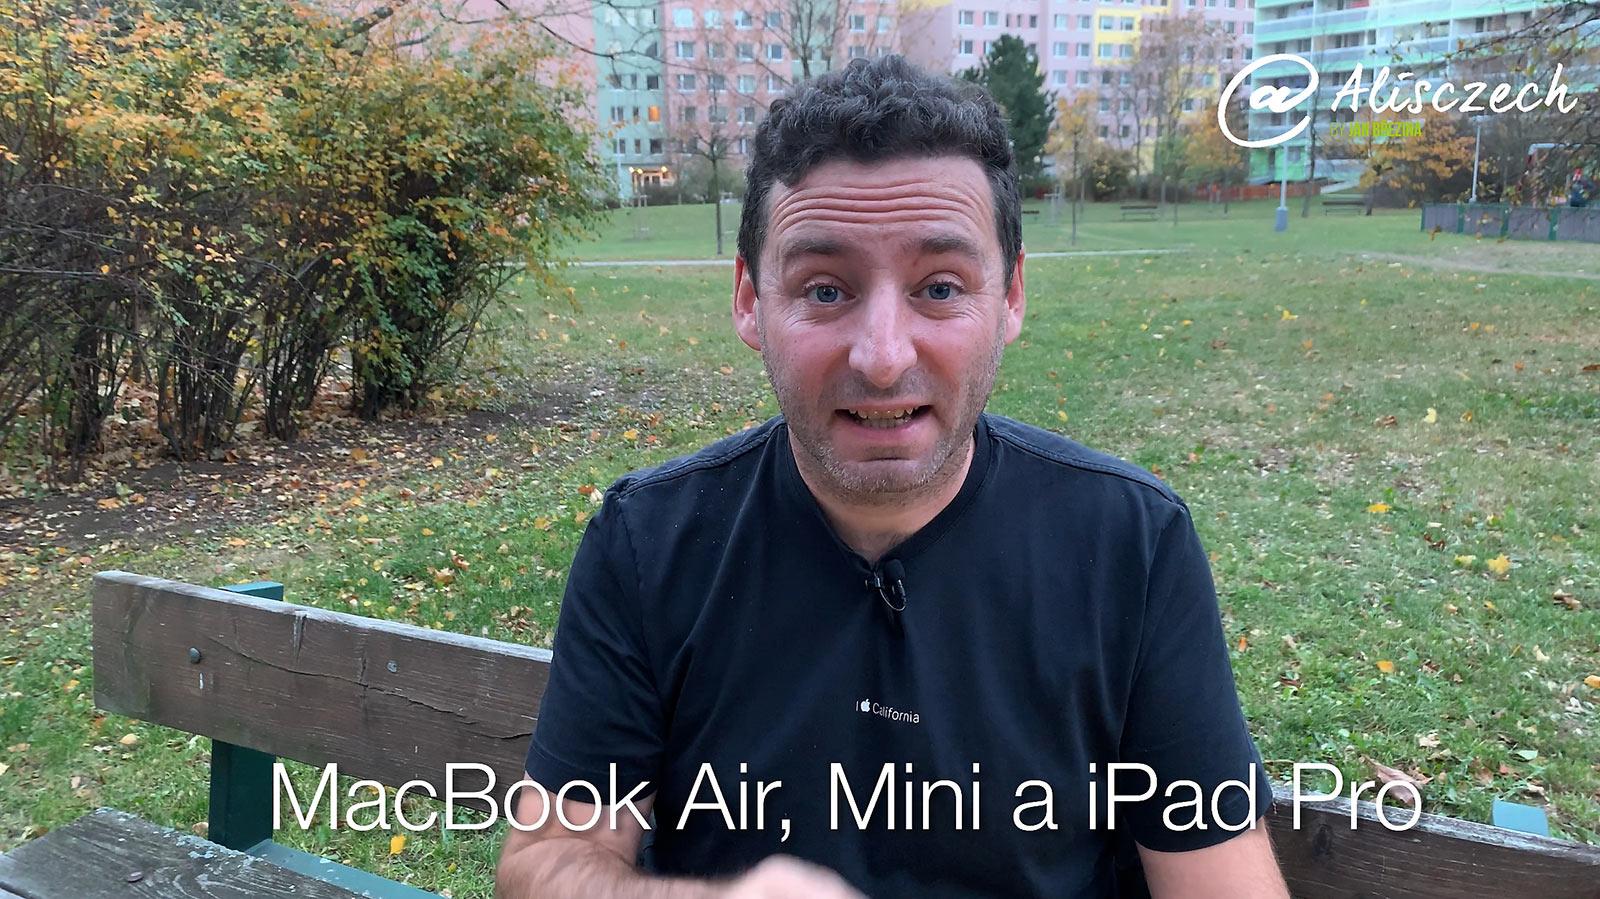 Macbook Air, Mac Mini a iPad Pro